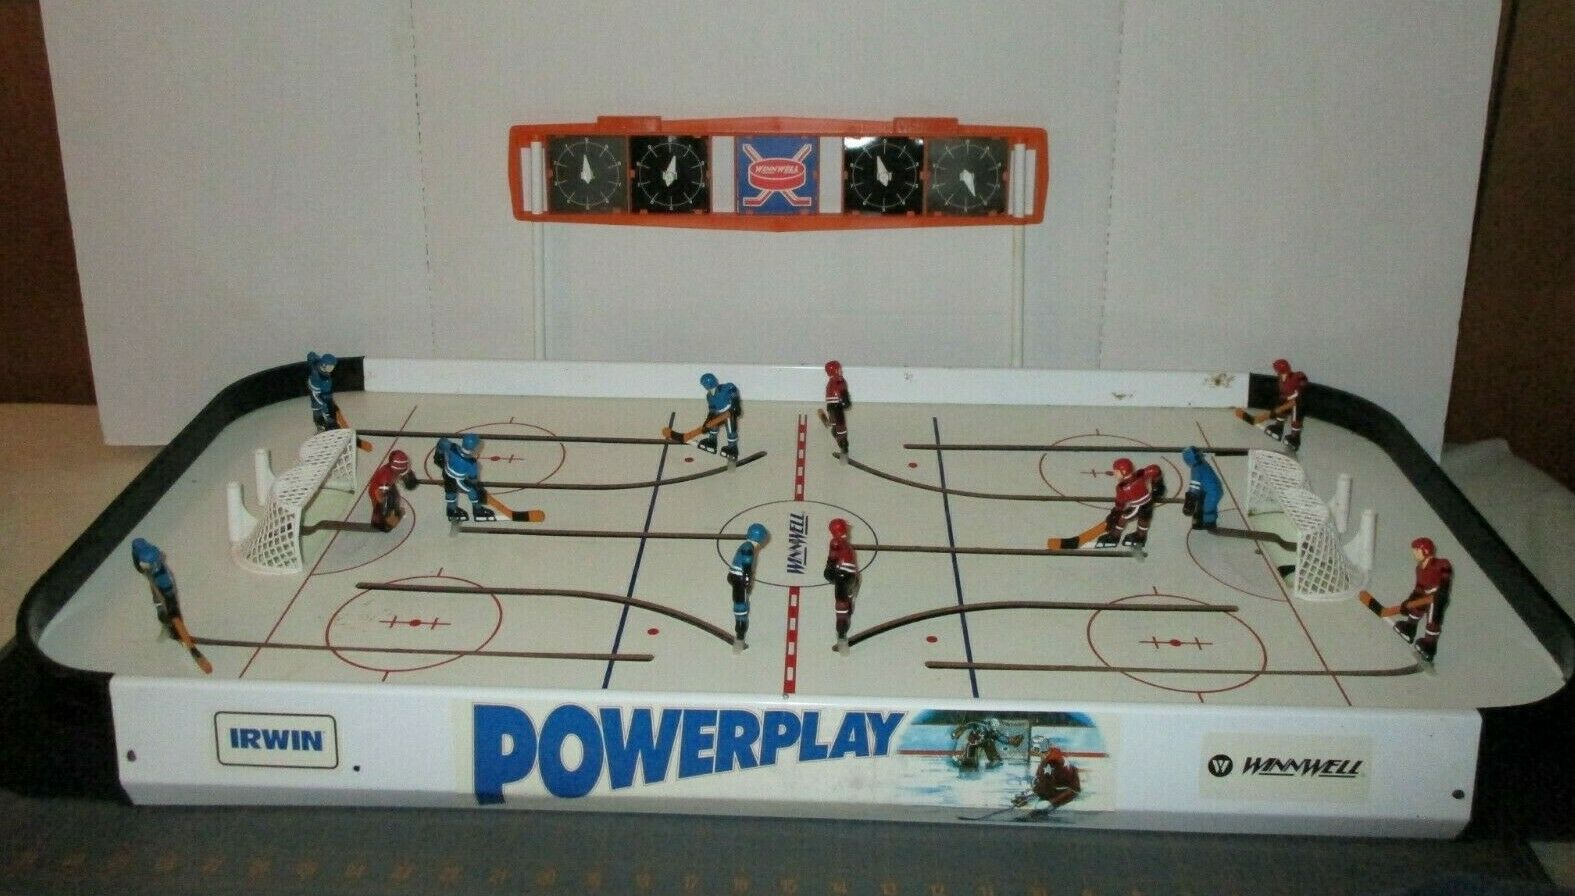 alto descuento Irwin winnwell winnwell winnwell Power Jugar Juego De Hockey De Mesa Años 90  hasta un 60% de descuento